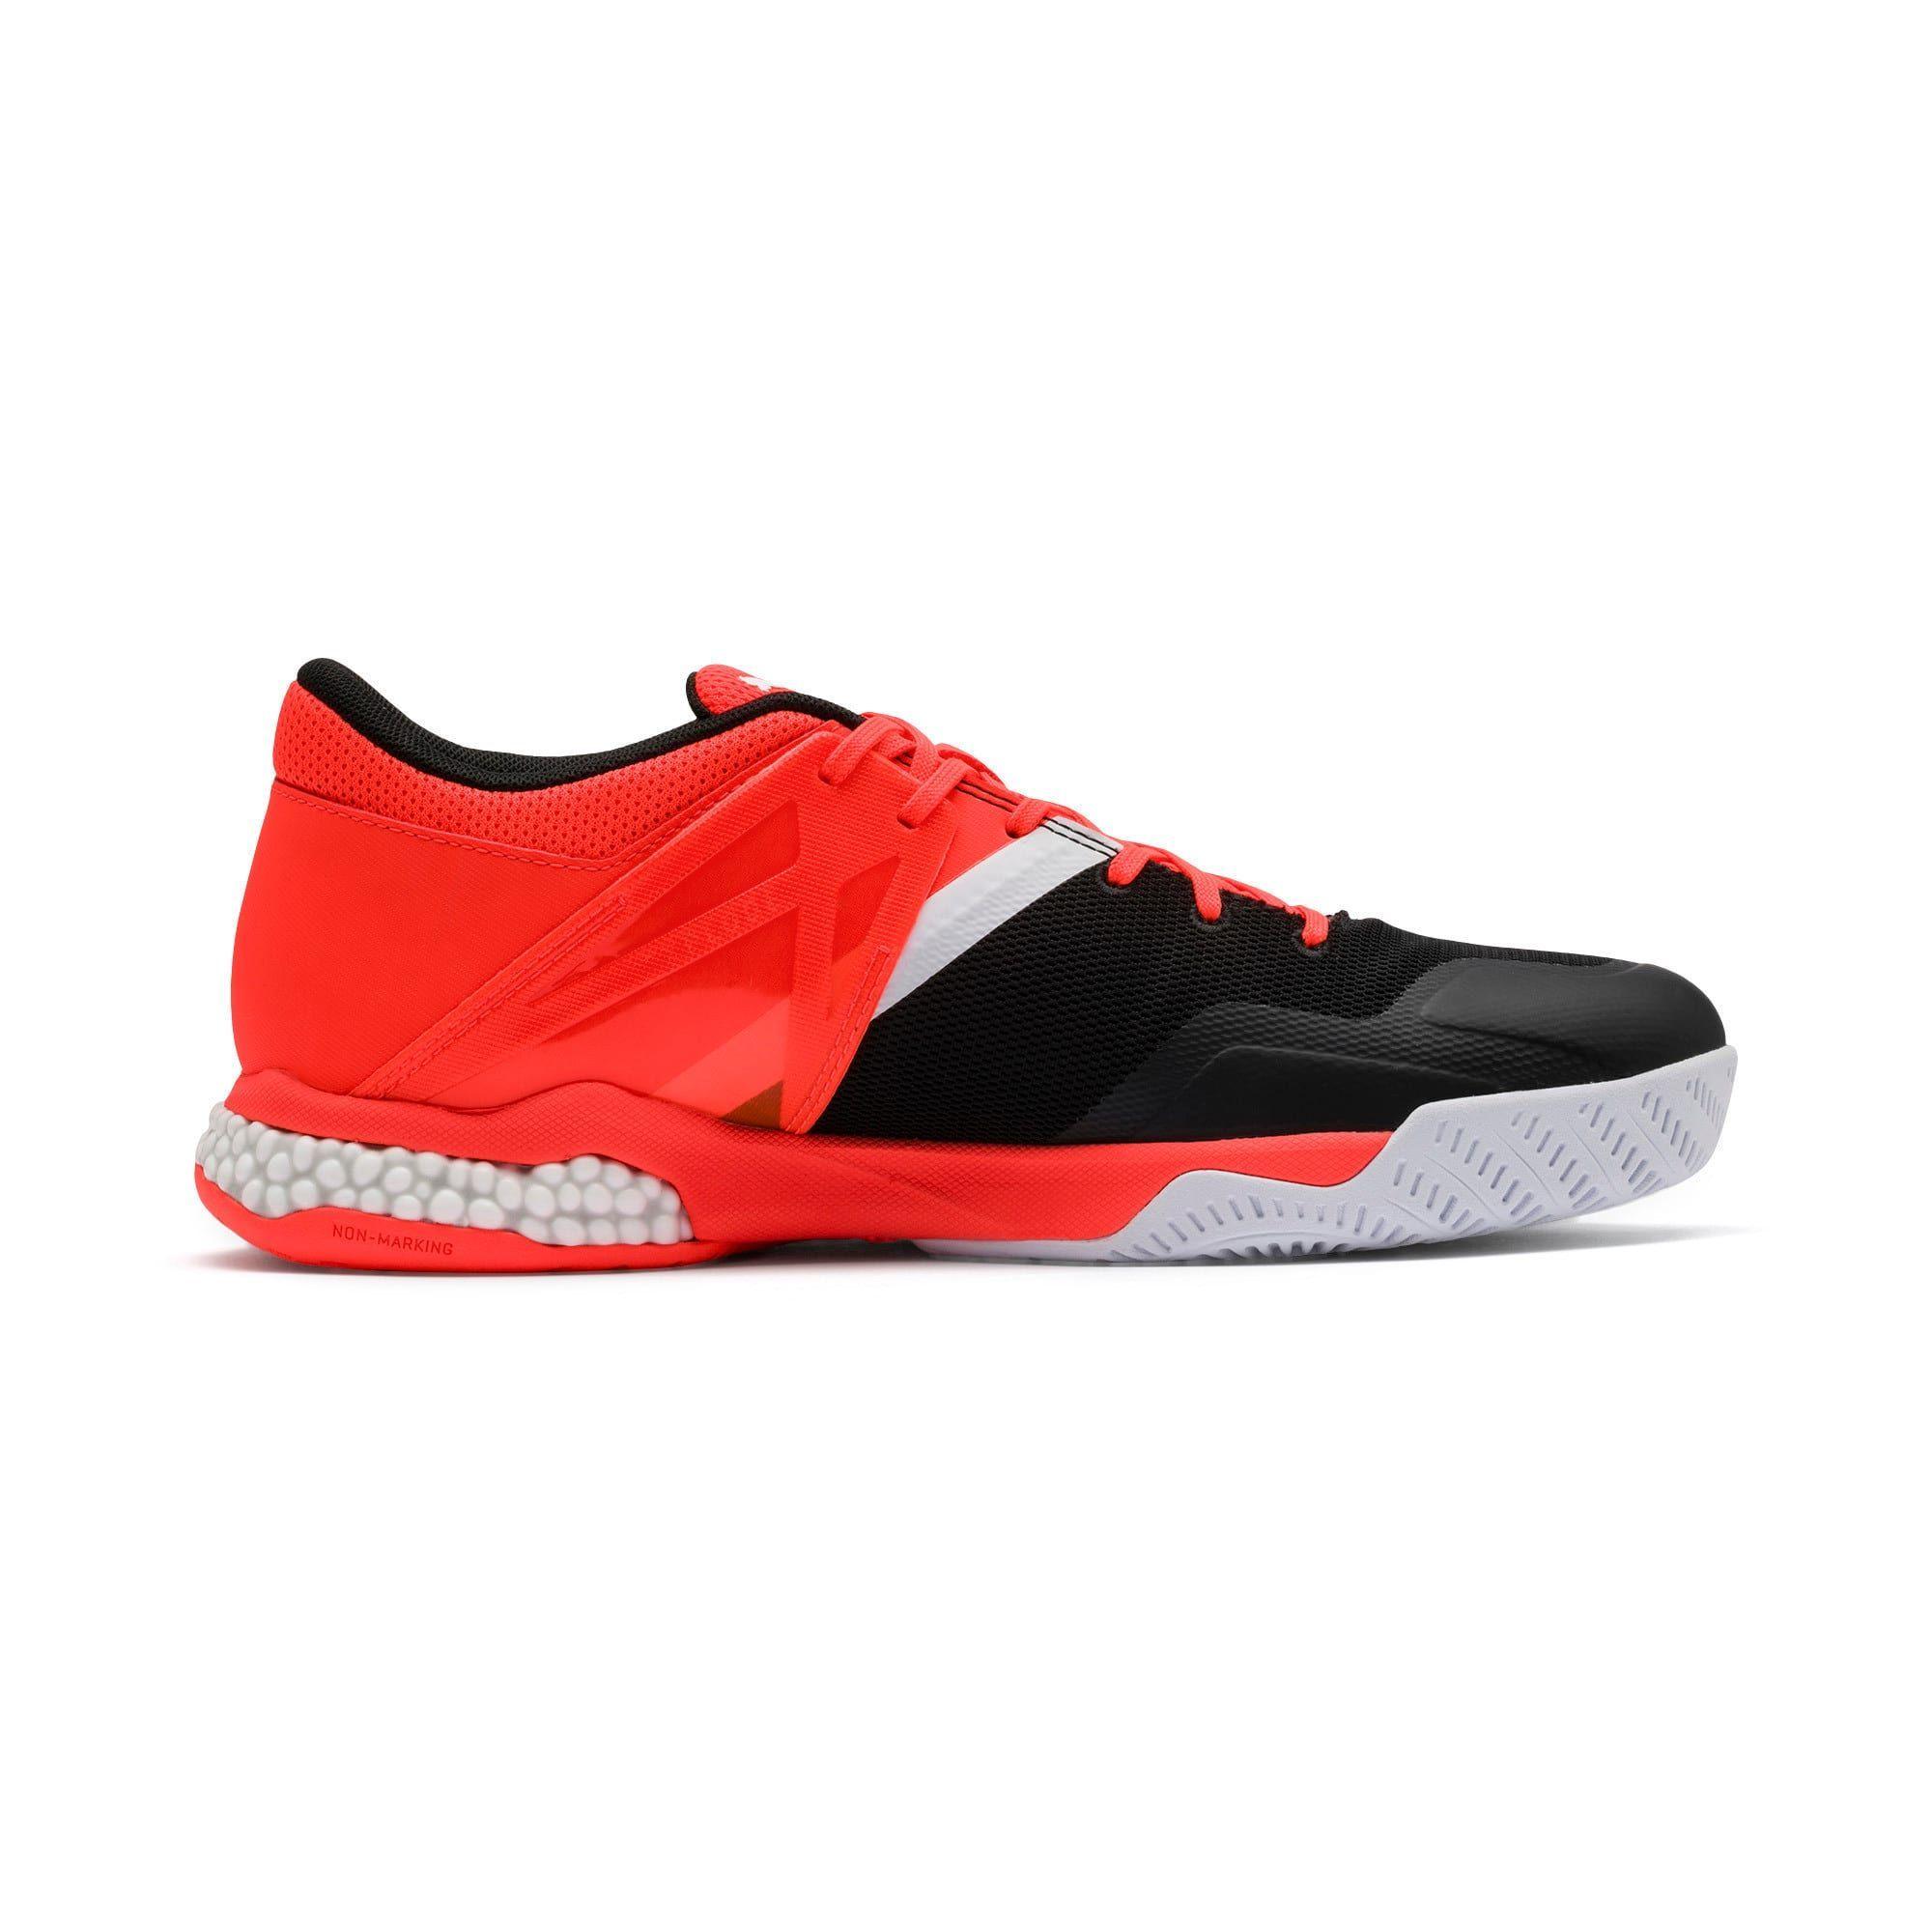 Puma Explode Xt Hybrid 2 Handball Shoes In Black White Red Size 11 5 Redshoes Puma Explode Xt Hybri Womens Athletic Shoes Shoes With Jeans Athletic Shoes Nike